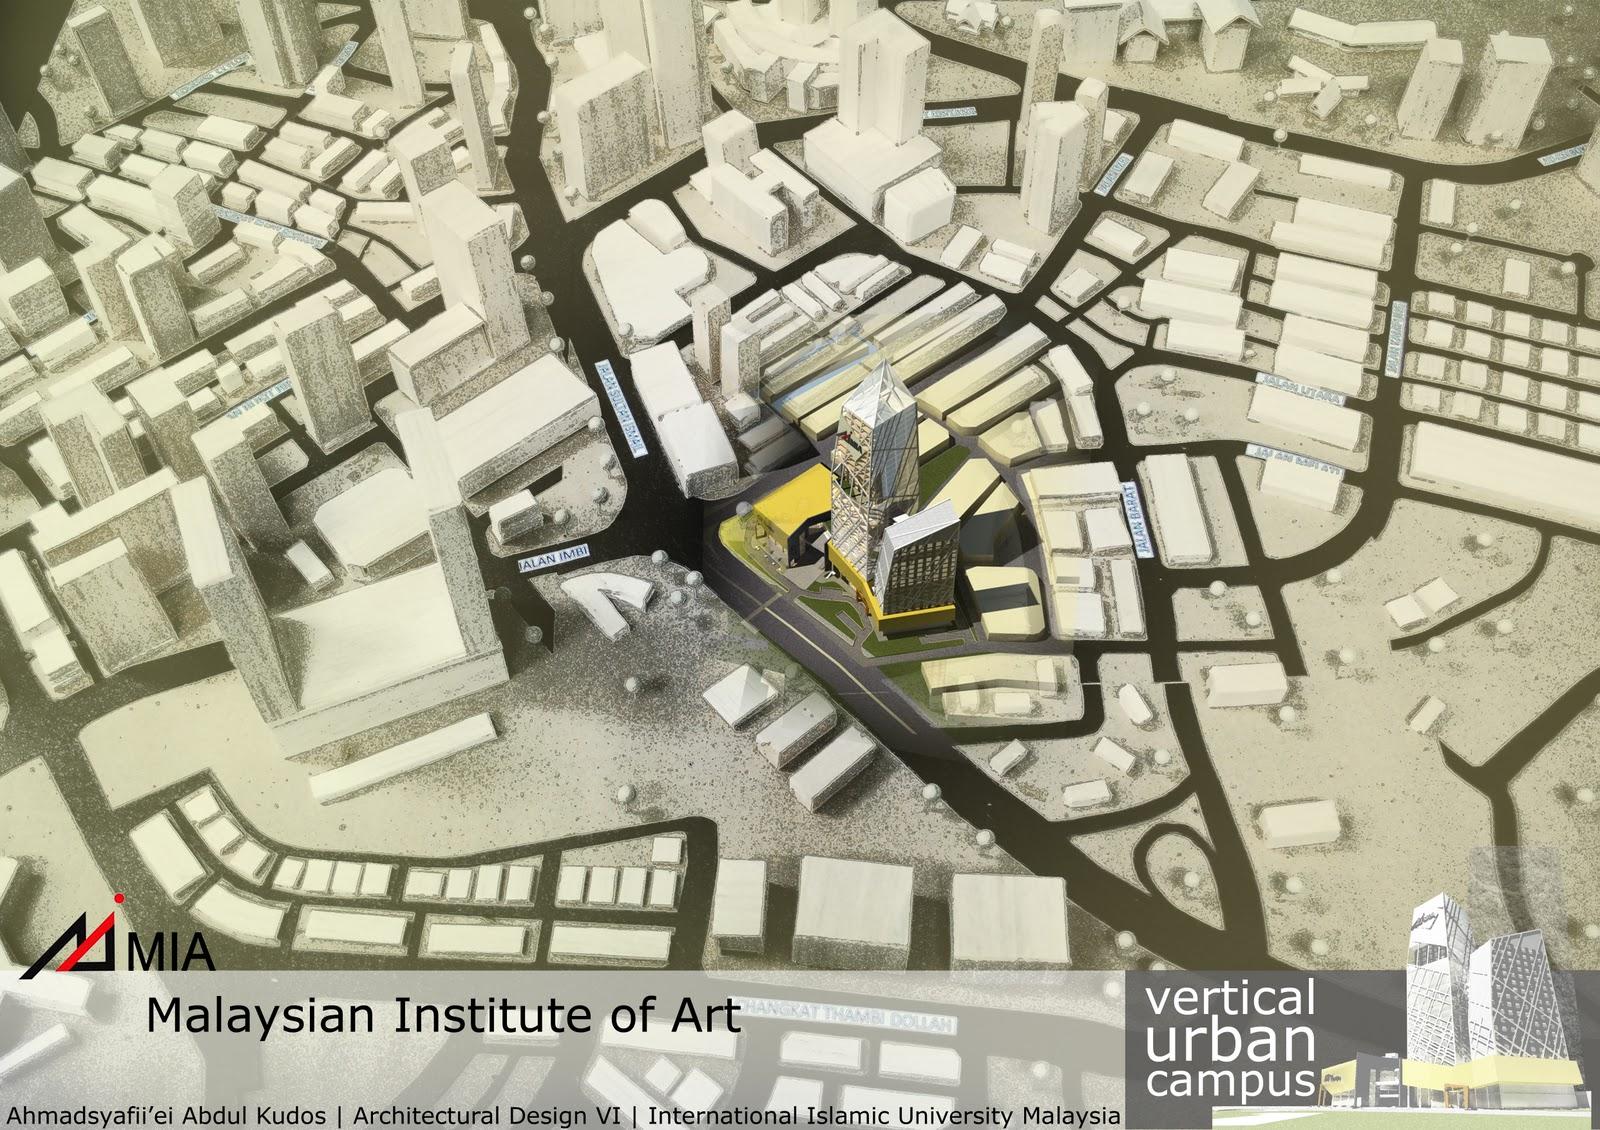 Piei S Portfolio Vertical Urban Campus For Malaysian Institute Of Art 4th Year 2nd Semester